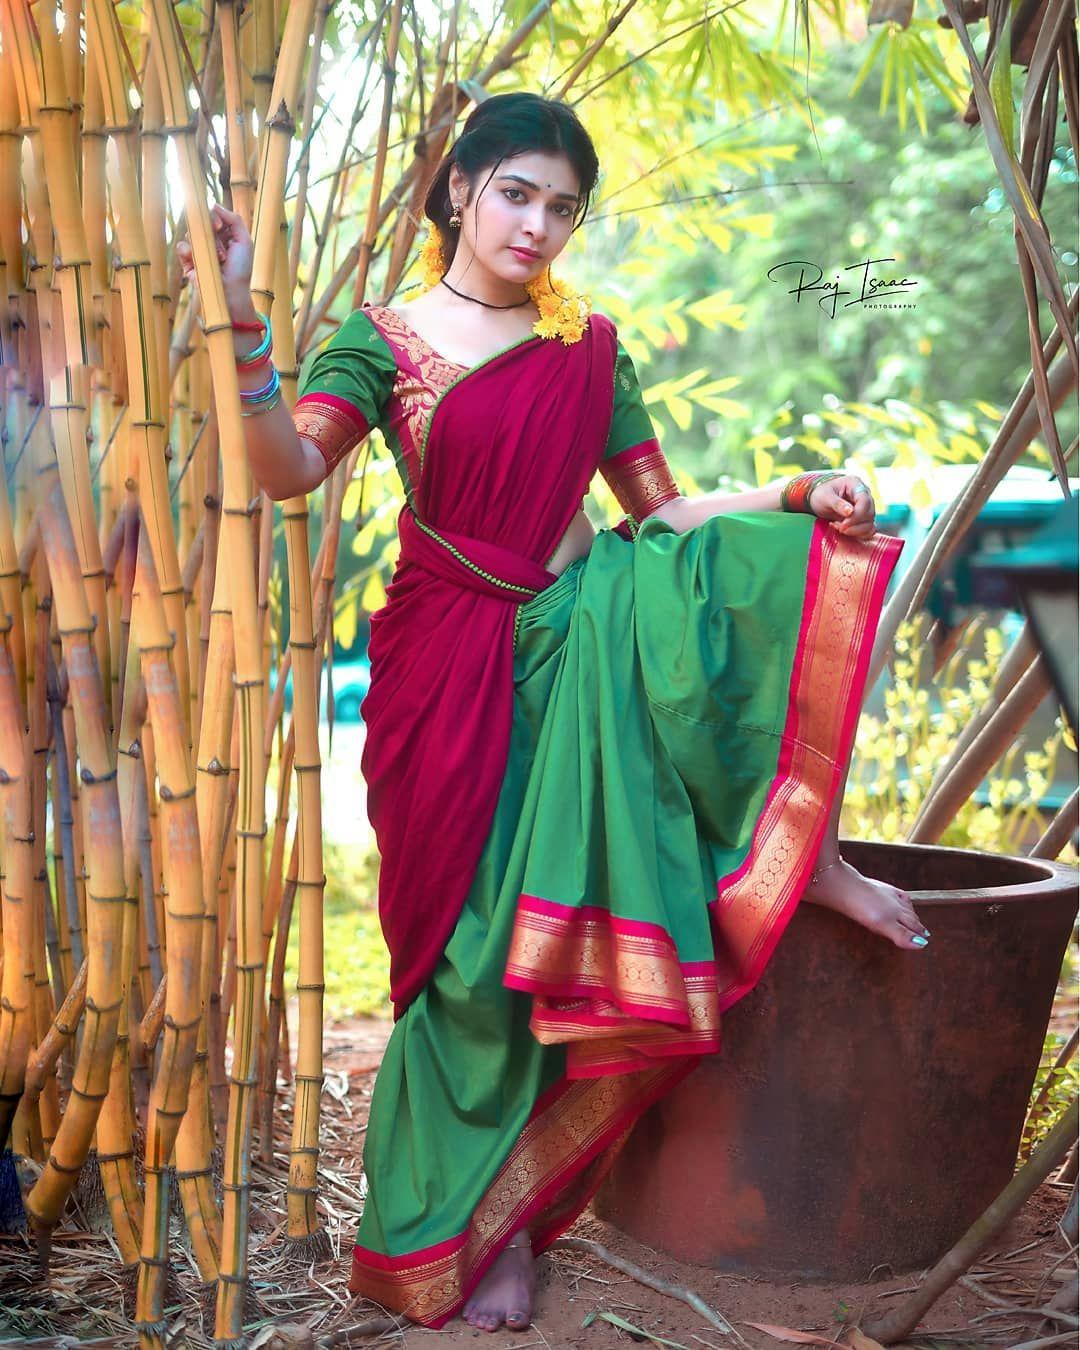 dharsha gupta instagram images